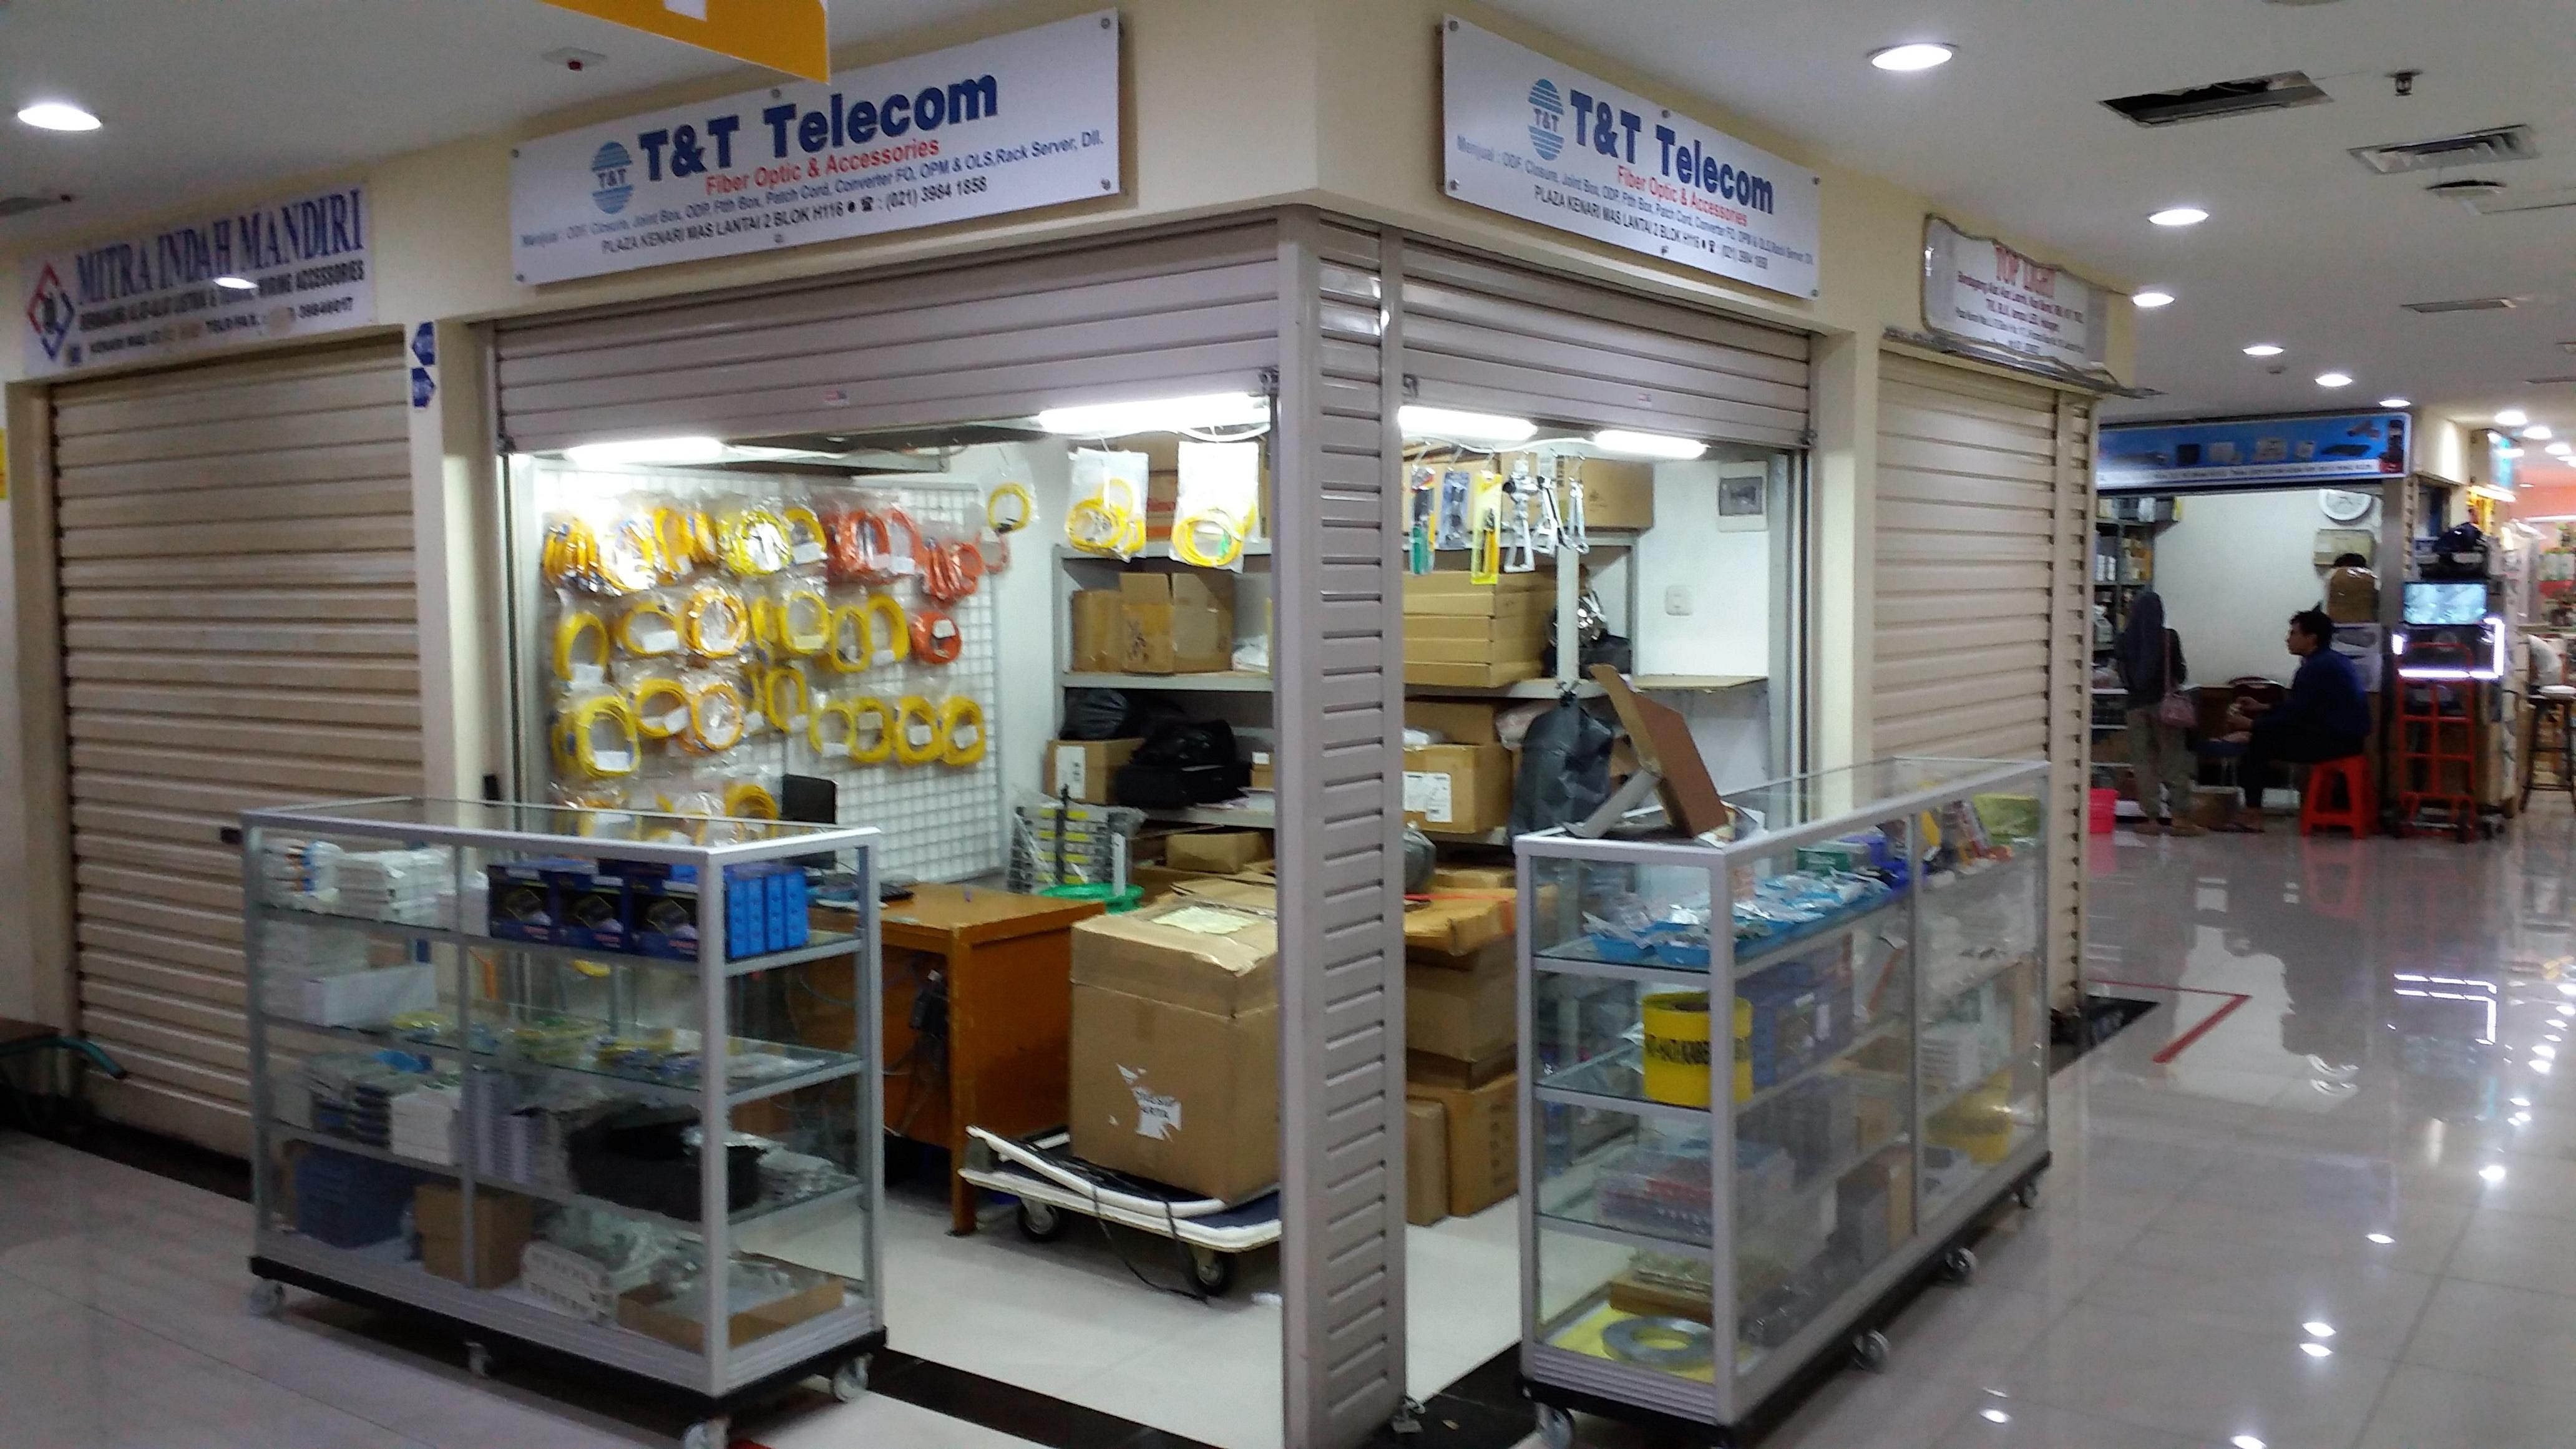 T&T Telecom